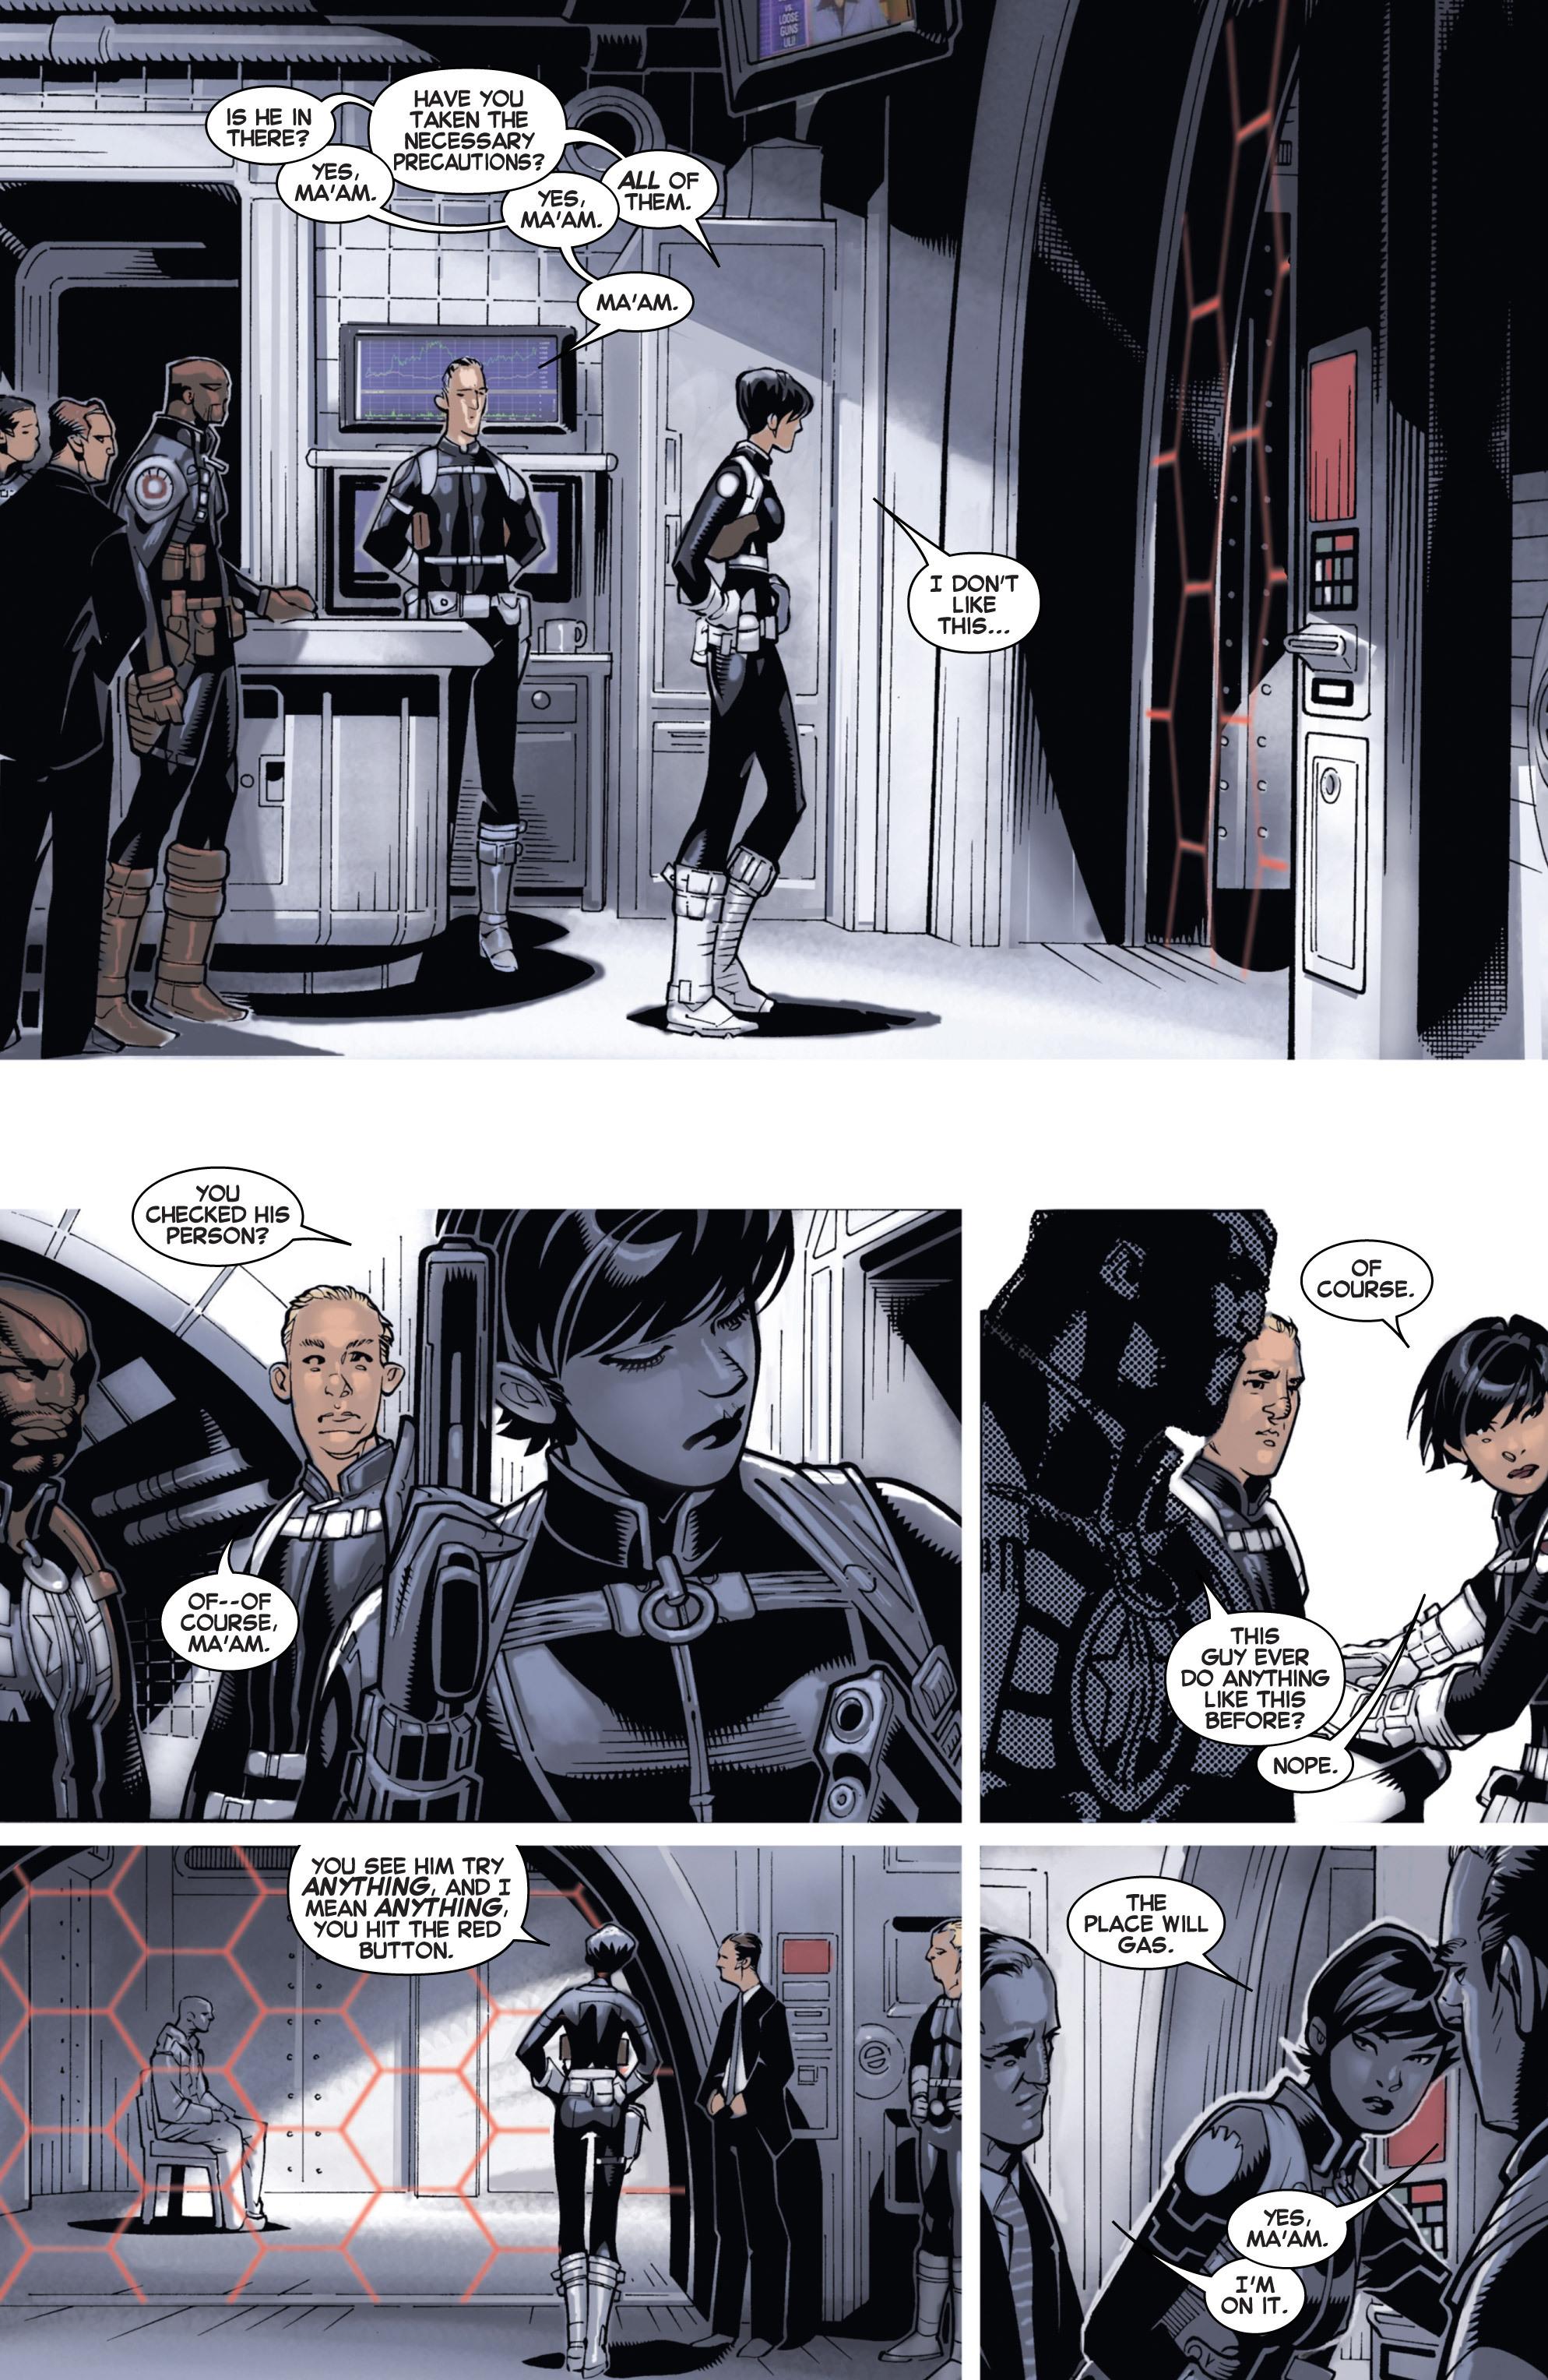 Read online Uncanny X-Men (2013) comic -  Issue # _TPB 1 - Revolution - 6